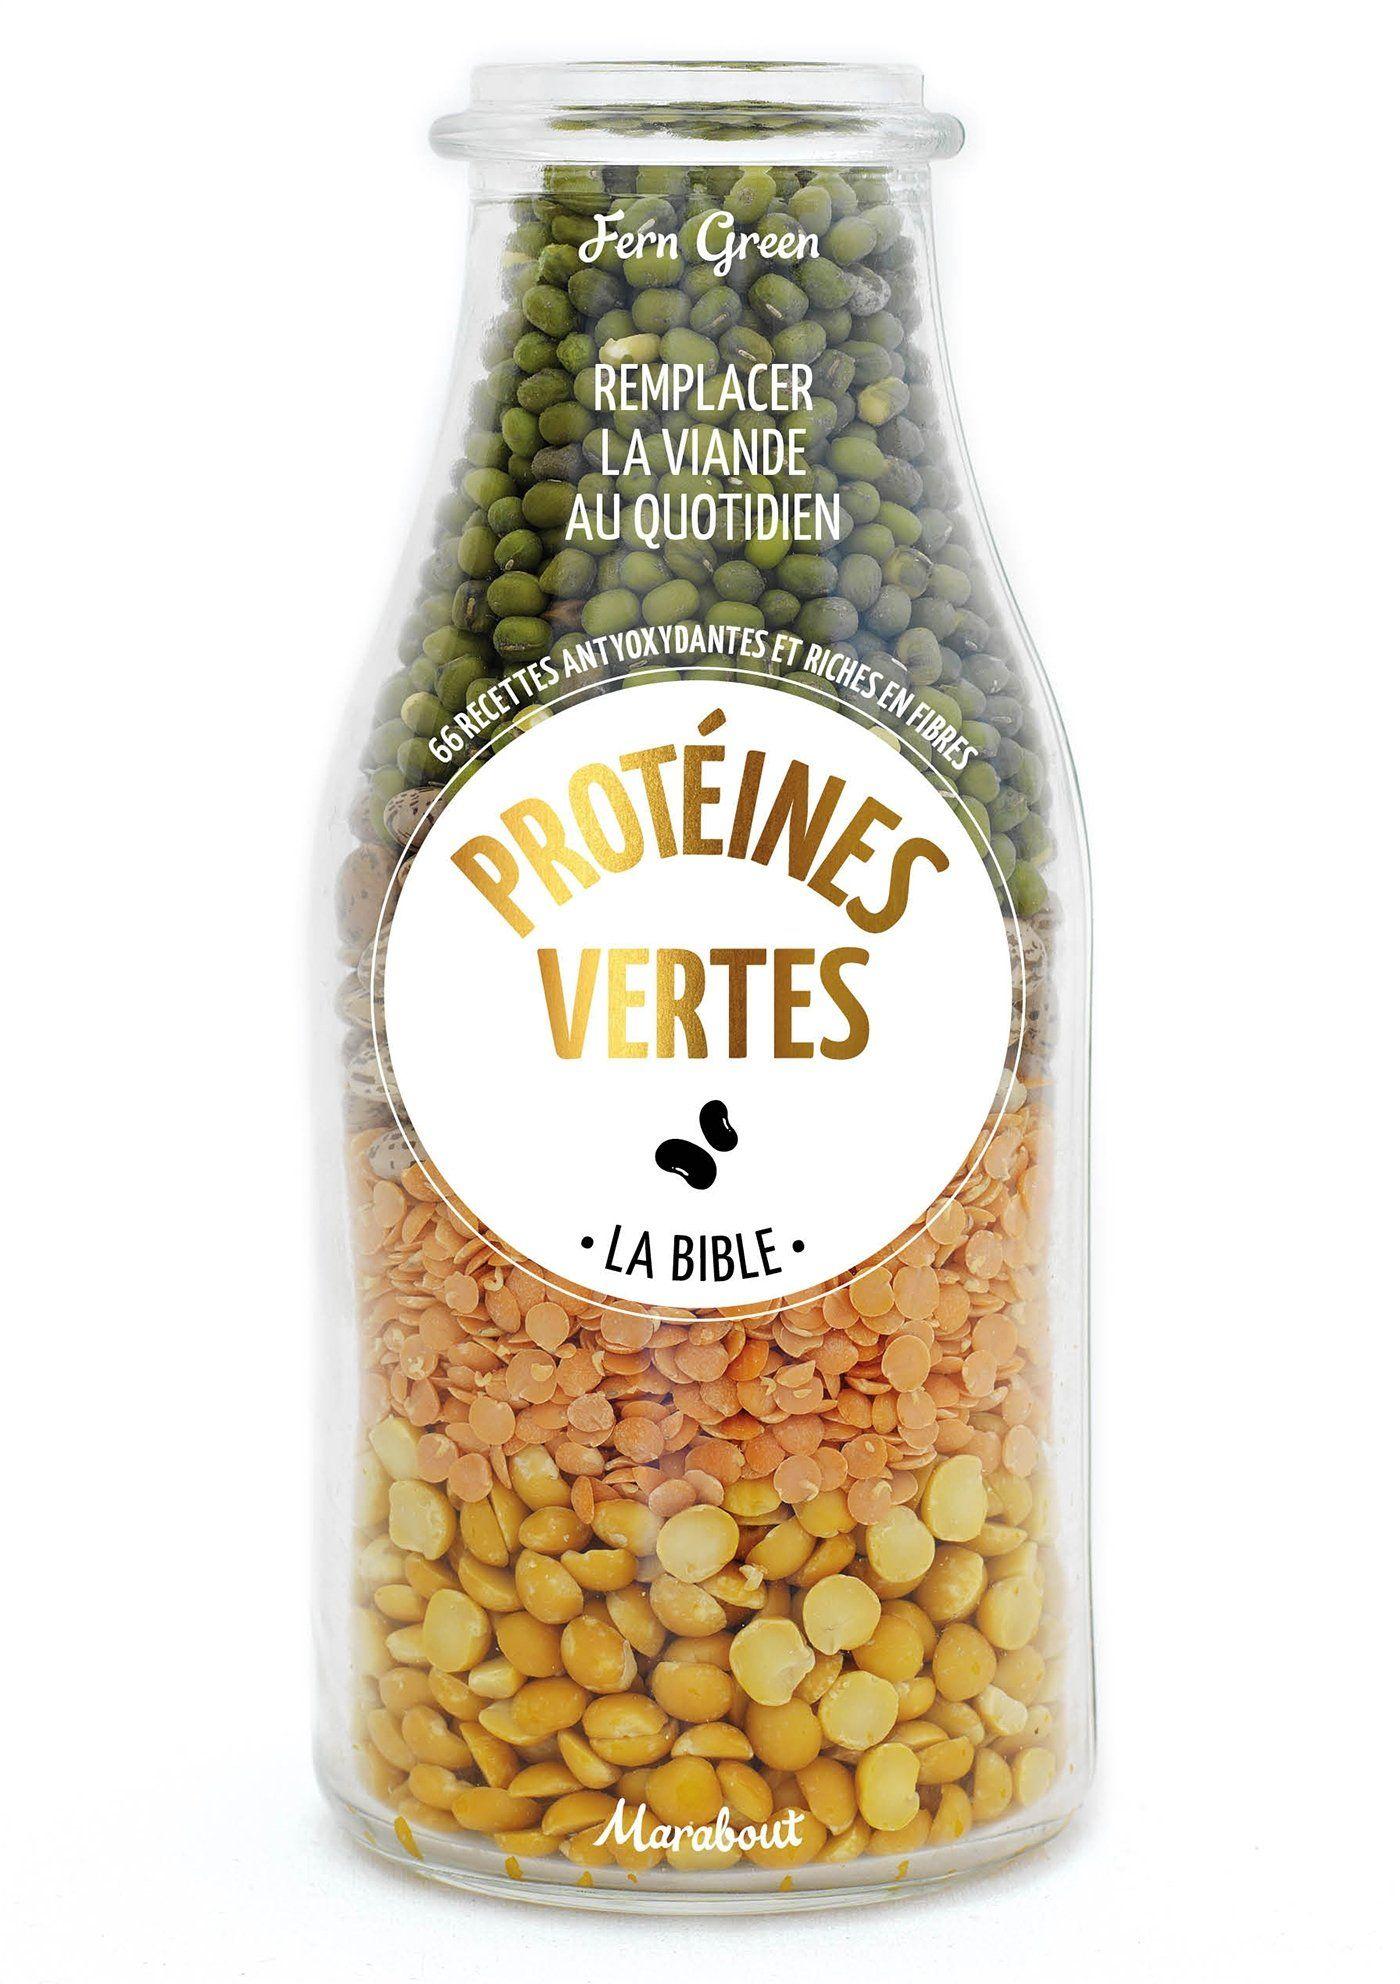 Protéines vertes - La Bible, de Fern Green (2015).